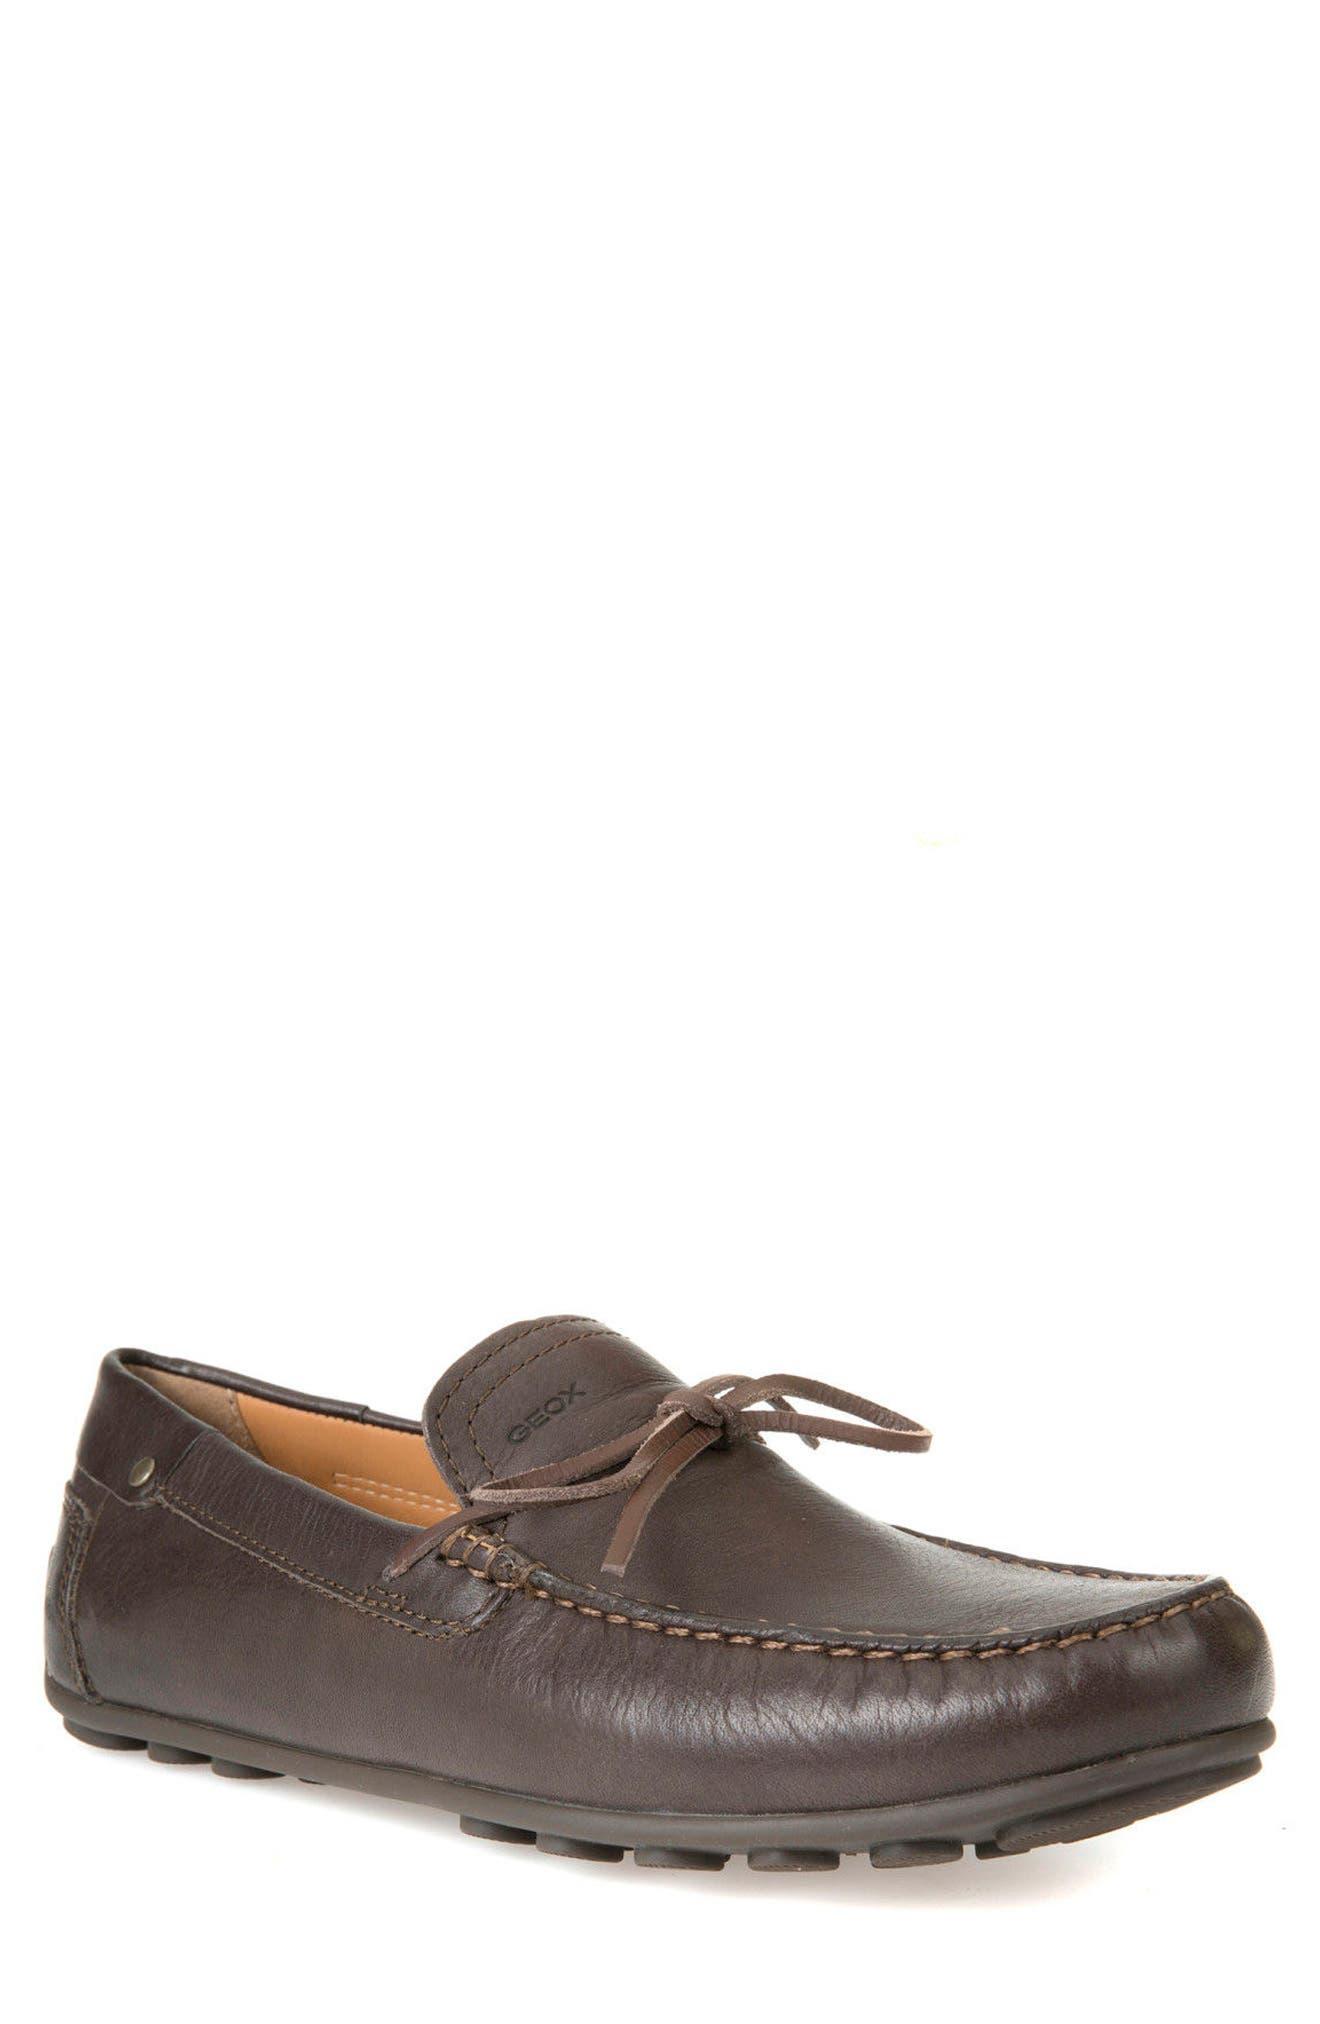 Geox Giona 9 Driving Shoe (Men)